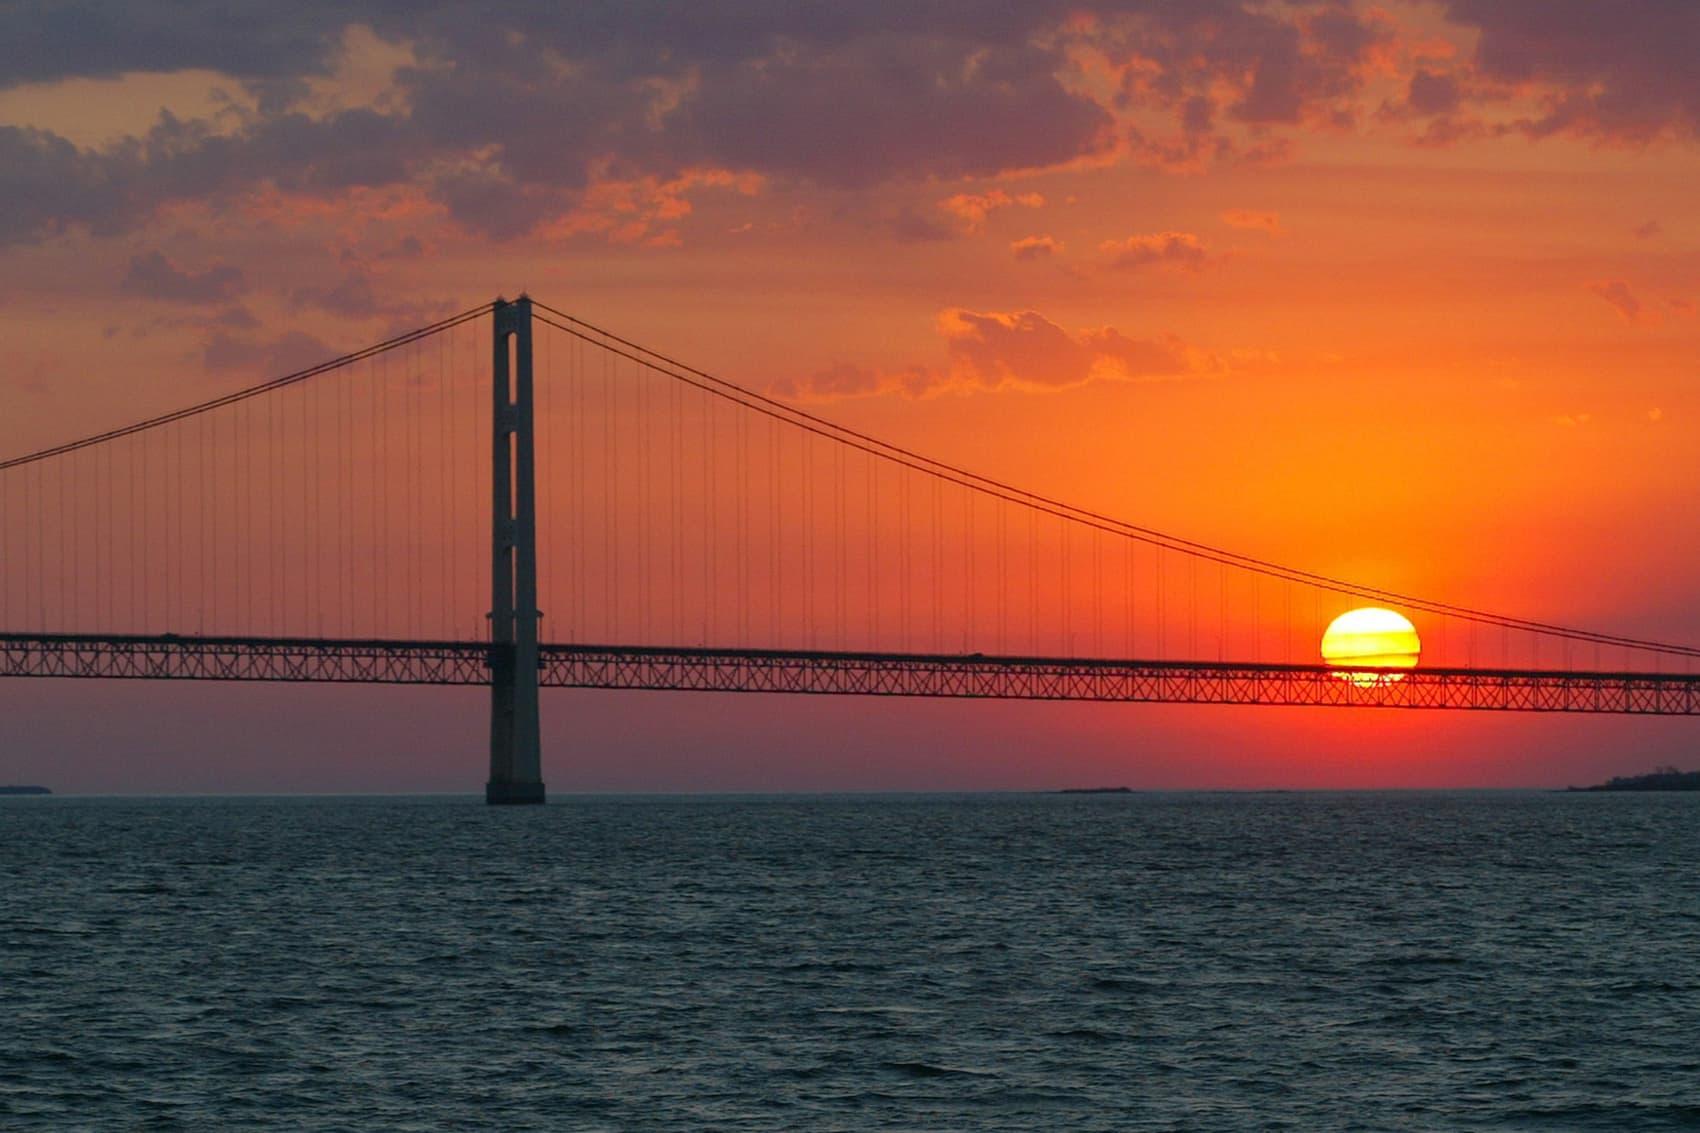 The sun sets over the Mackinac Bridge and the Mackinac Straits as seen from Lake Huron. The bridge is the dividing line between Lake Michigan to the west and Lake Huron to the east. (AP Photo/Al Goldis)